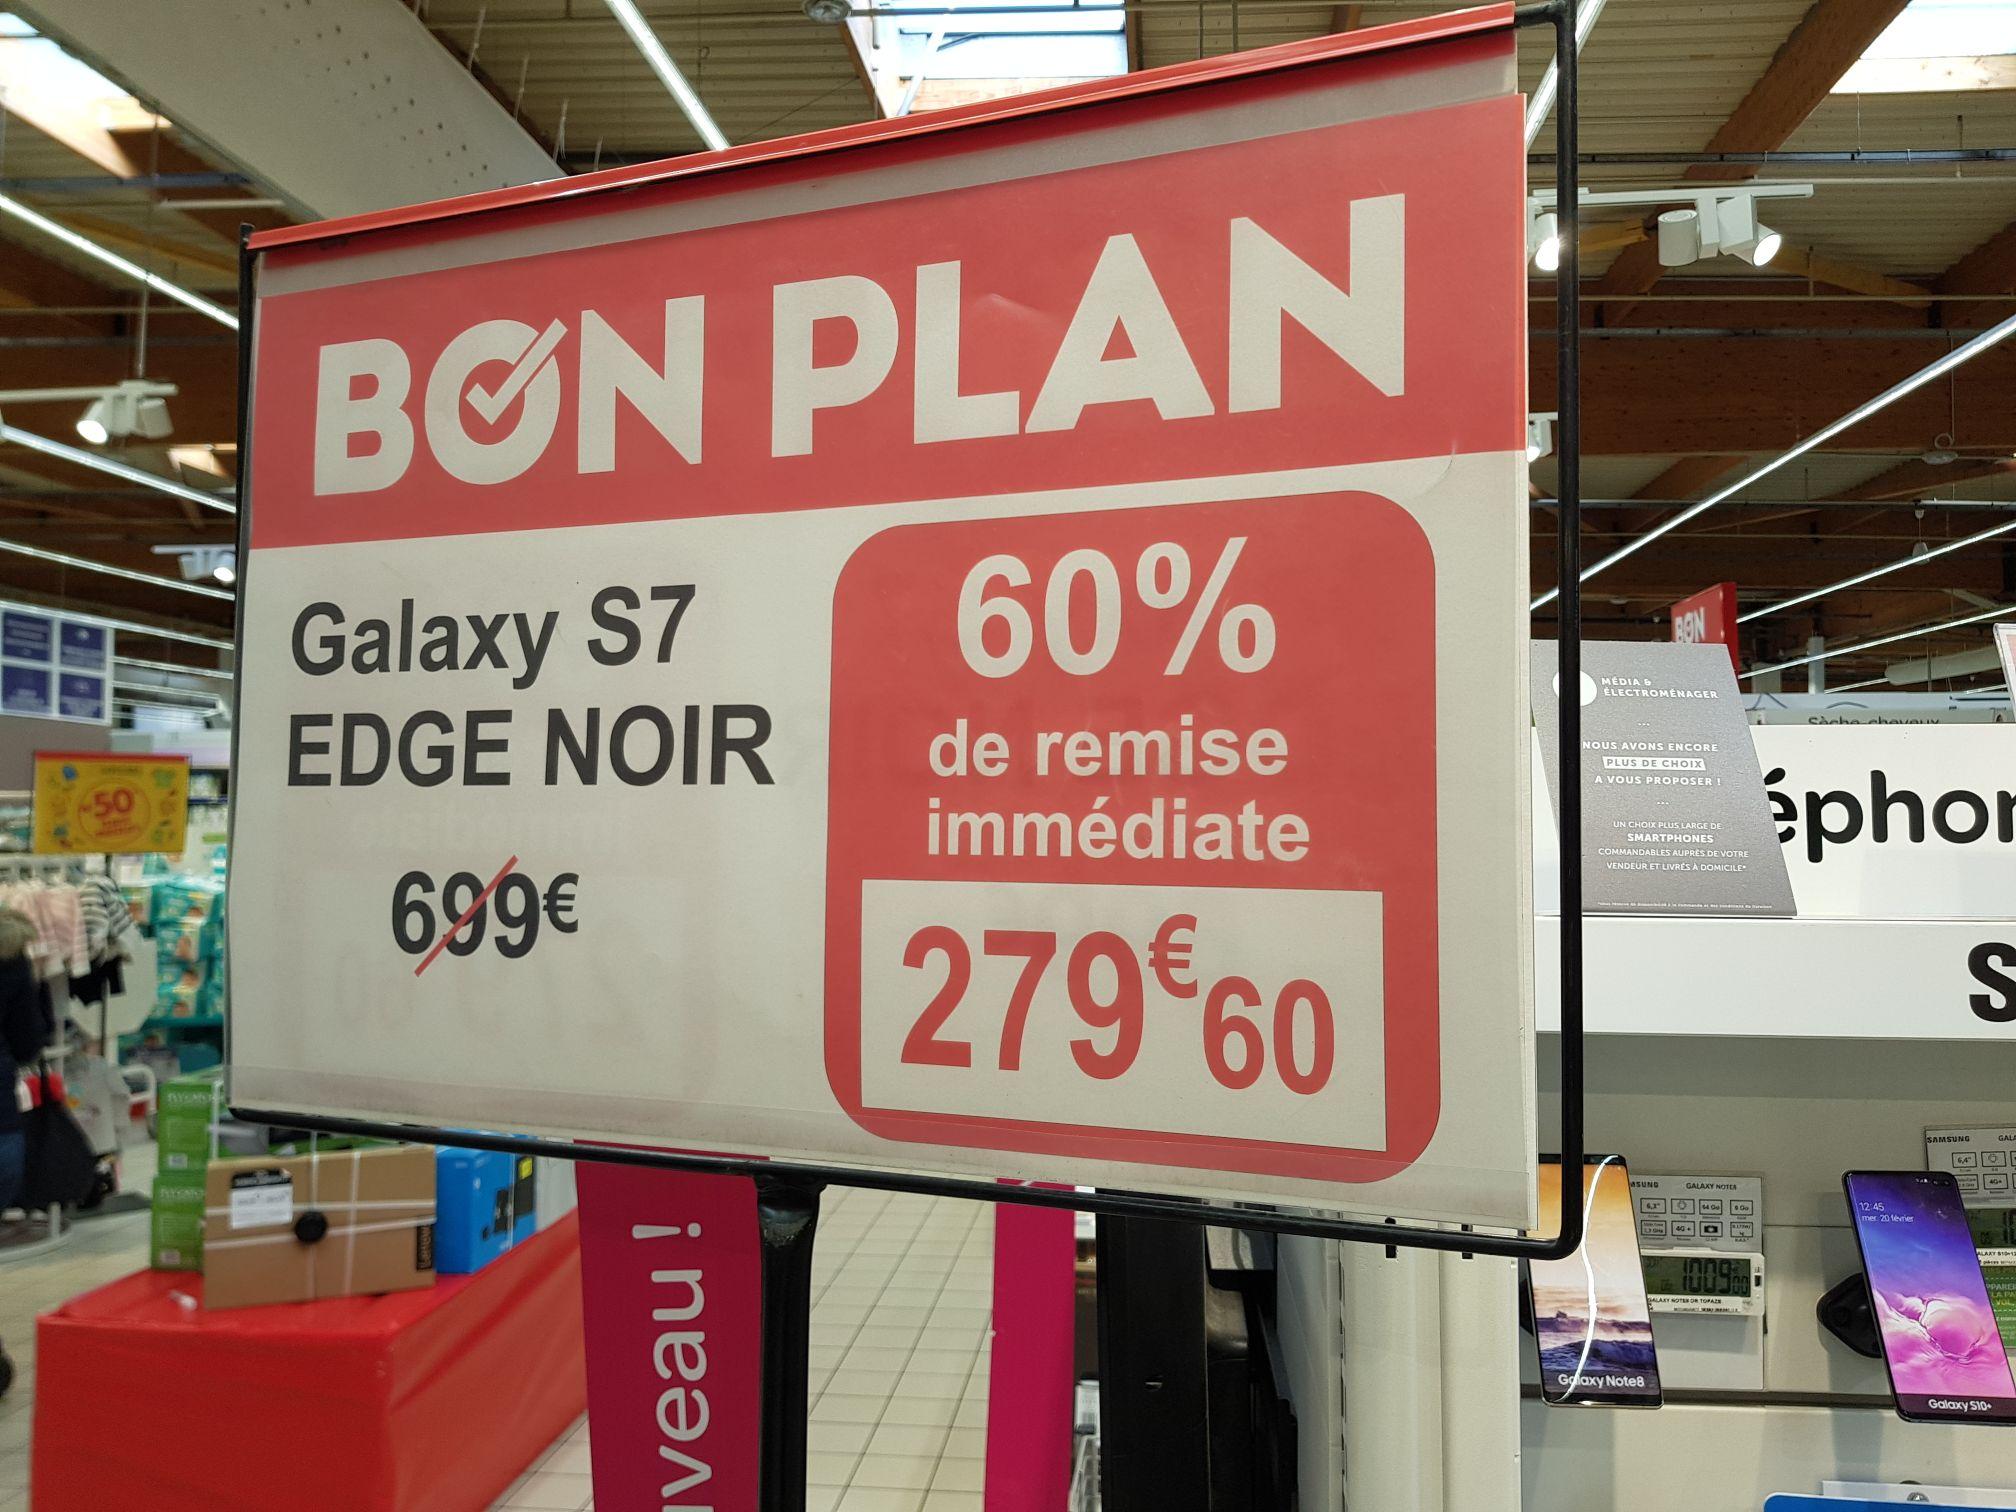 "Smartphone 5.5"" Samsung Galaxy S7 edge (QHD, Exynos 8890, 4 Go de RAM, 32 Go, noir) - Salaise-sur-Sanne (38)"